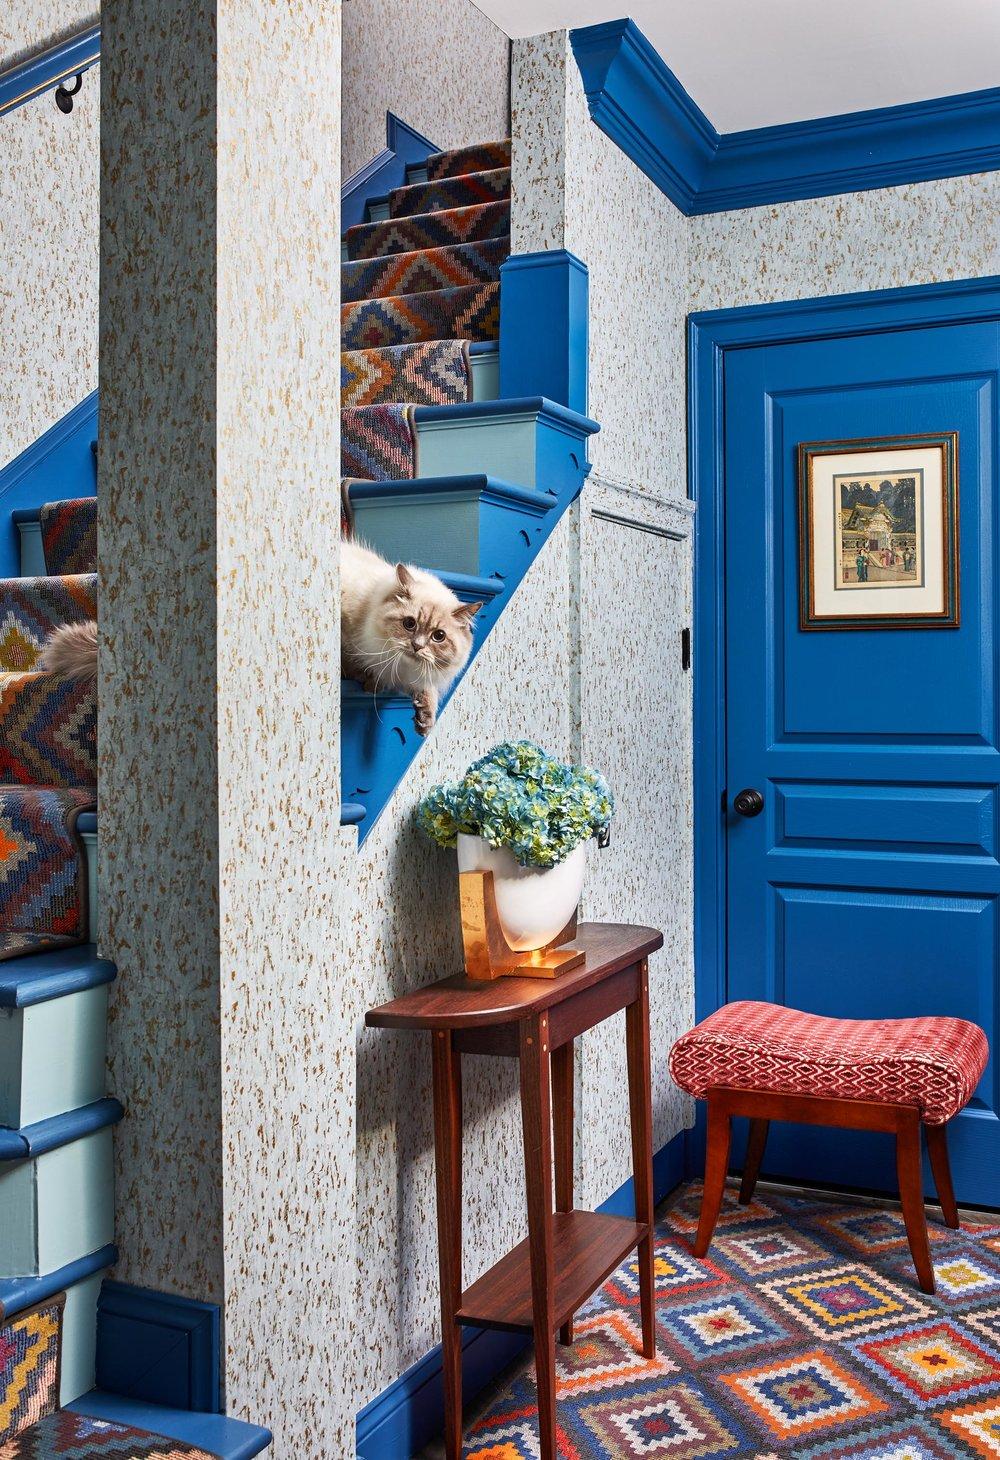 19-Modern-Contemporary-Entry-Hallway-Top-Decorator-Best-Interior-Designers-Boston-South-End-Back-Bay-Seaport-Dane-Austin-Design.jpg